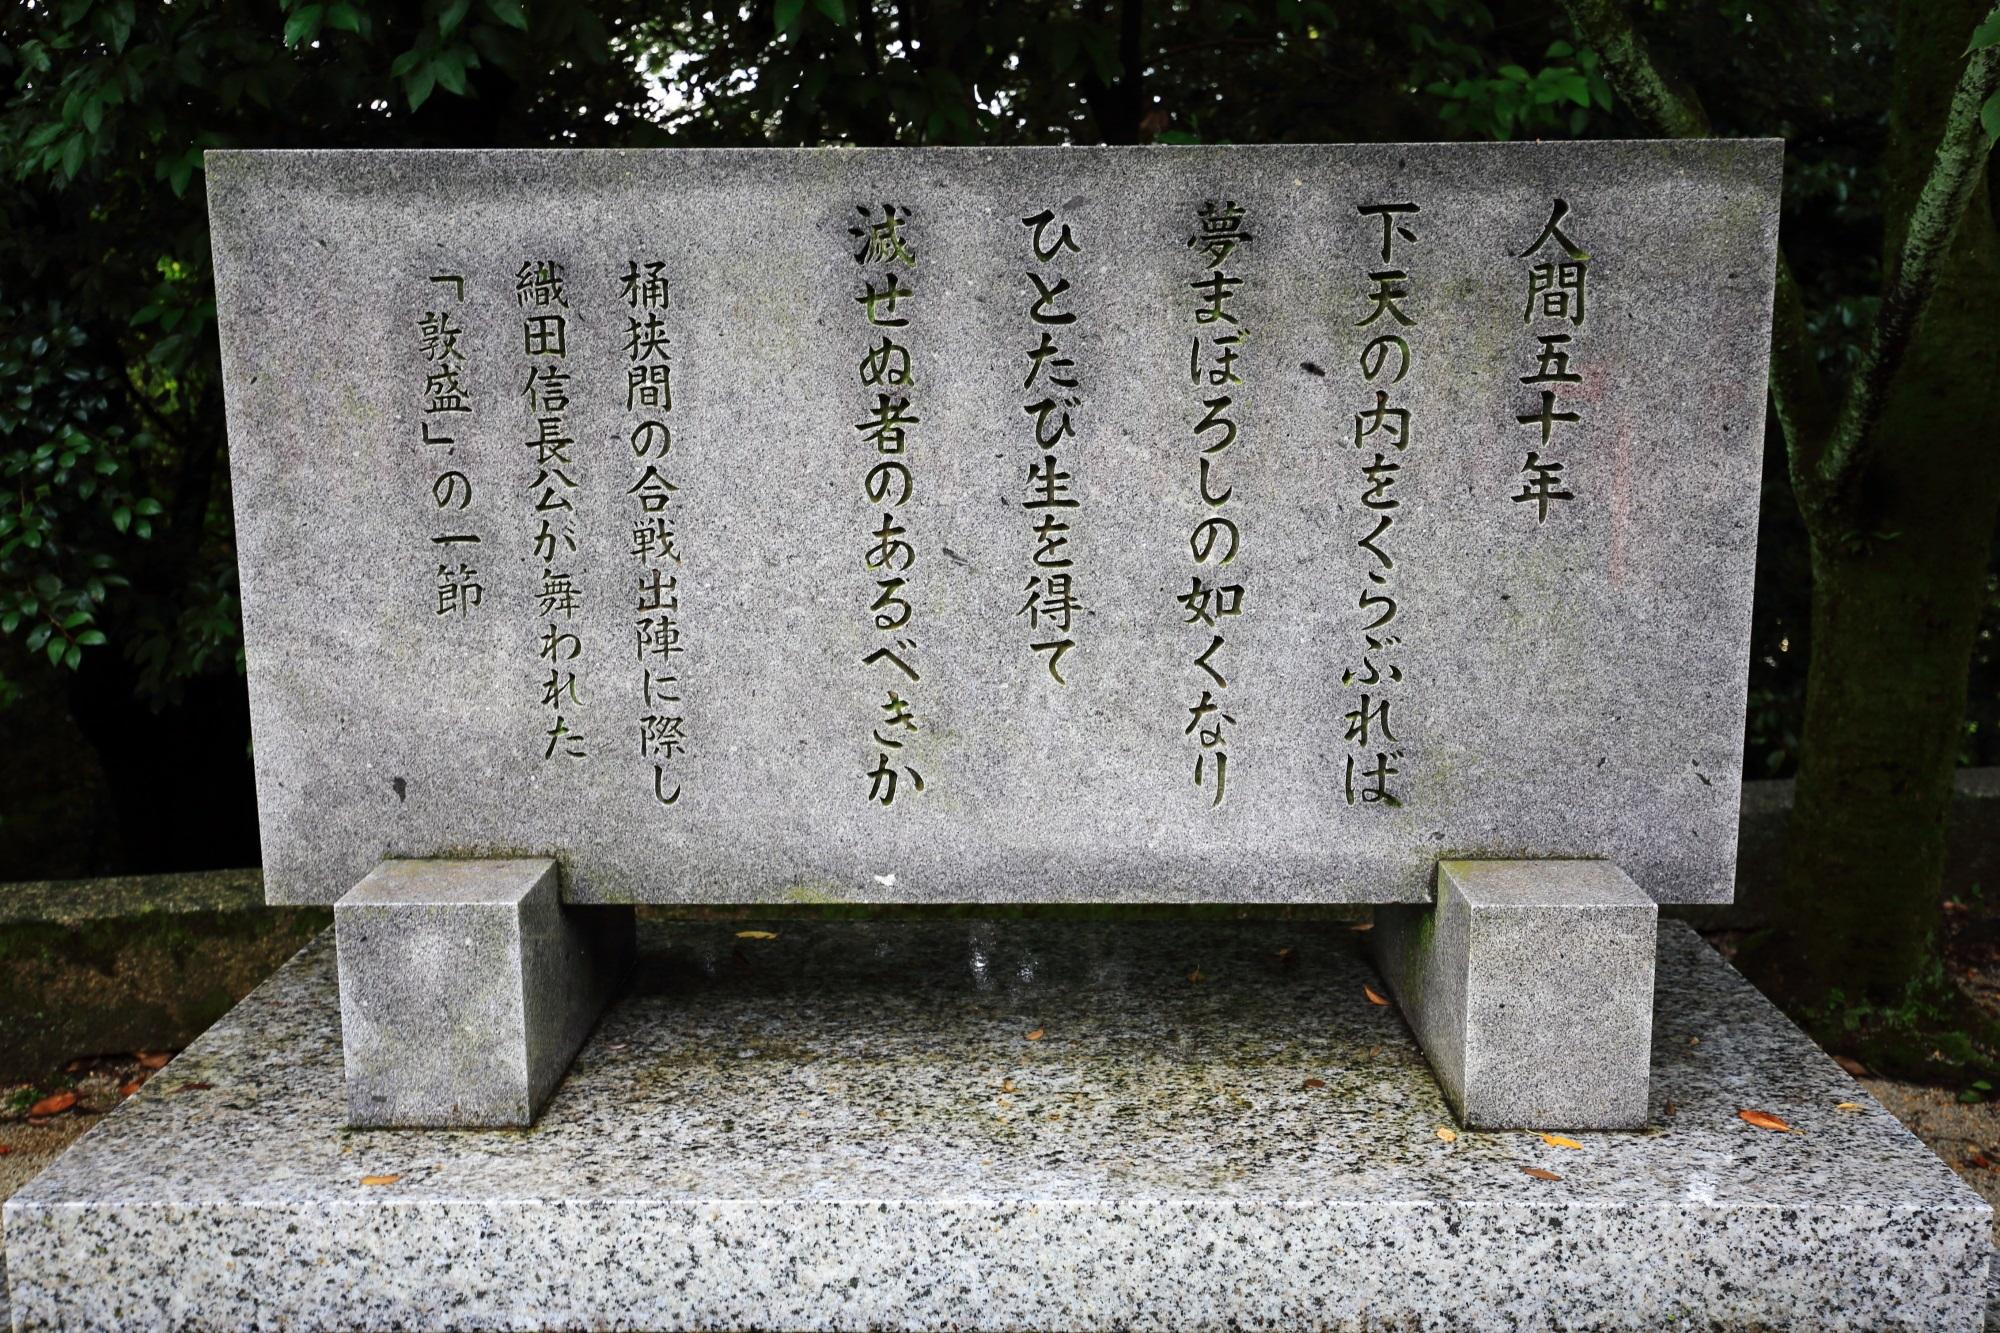 建勲神社の織田信長の「敦盛」の一節(人間五十年)